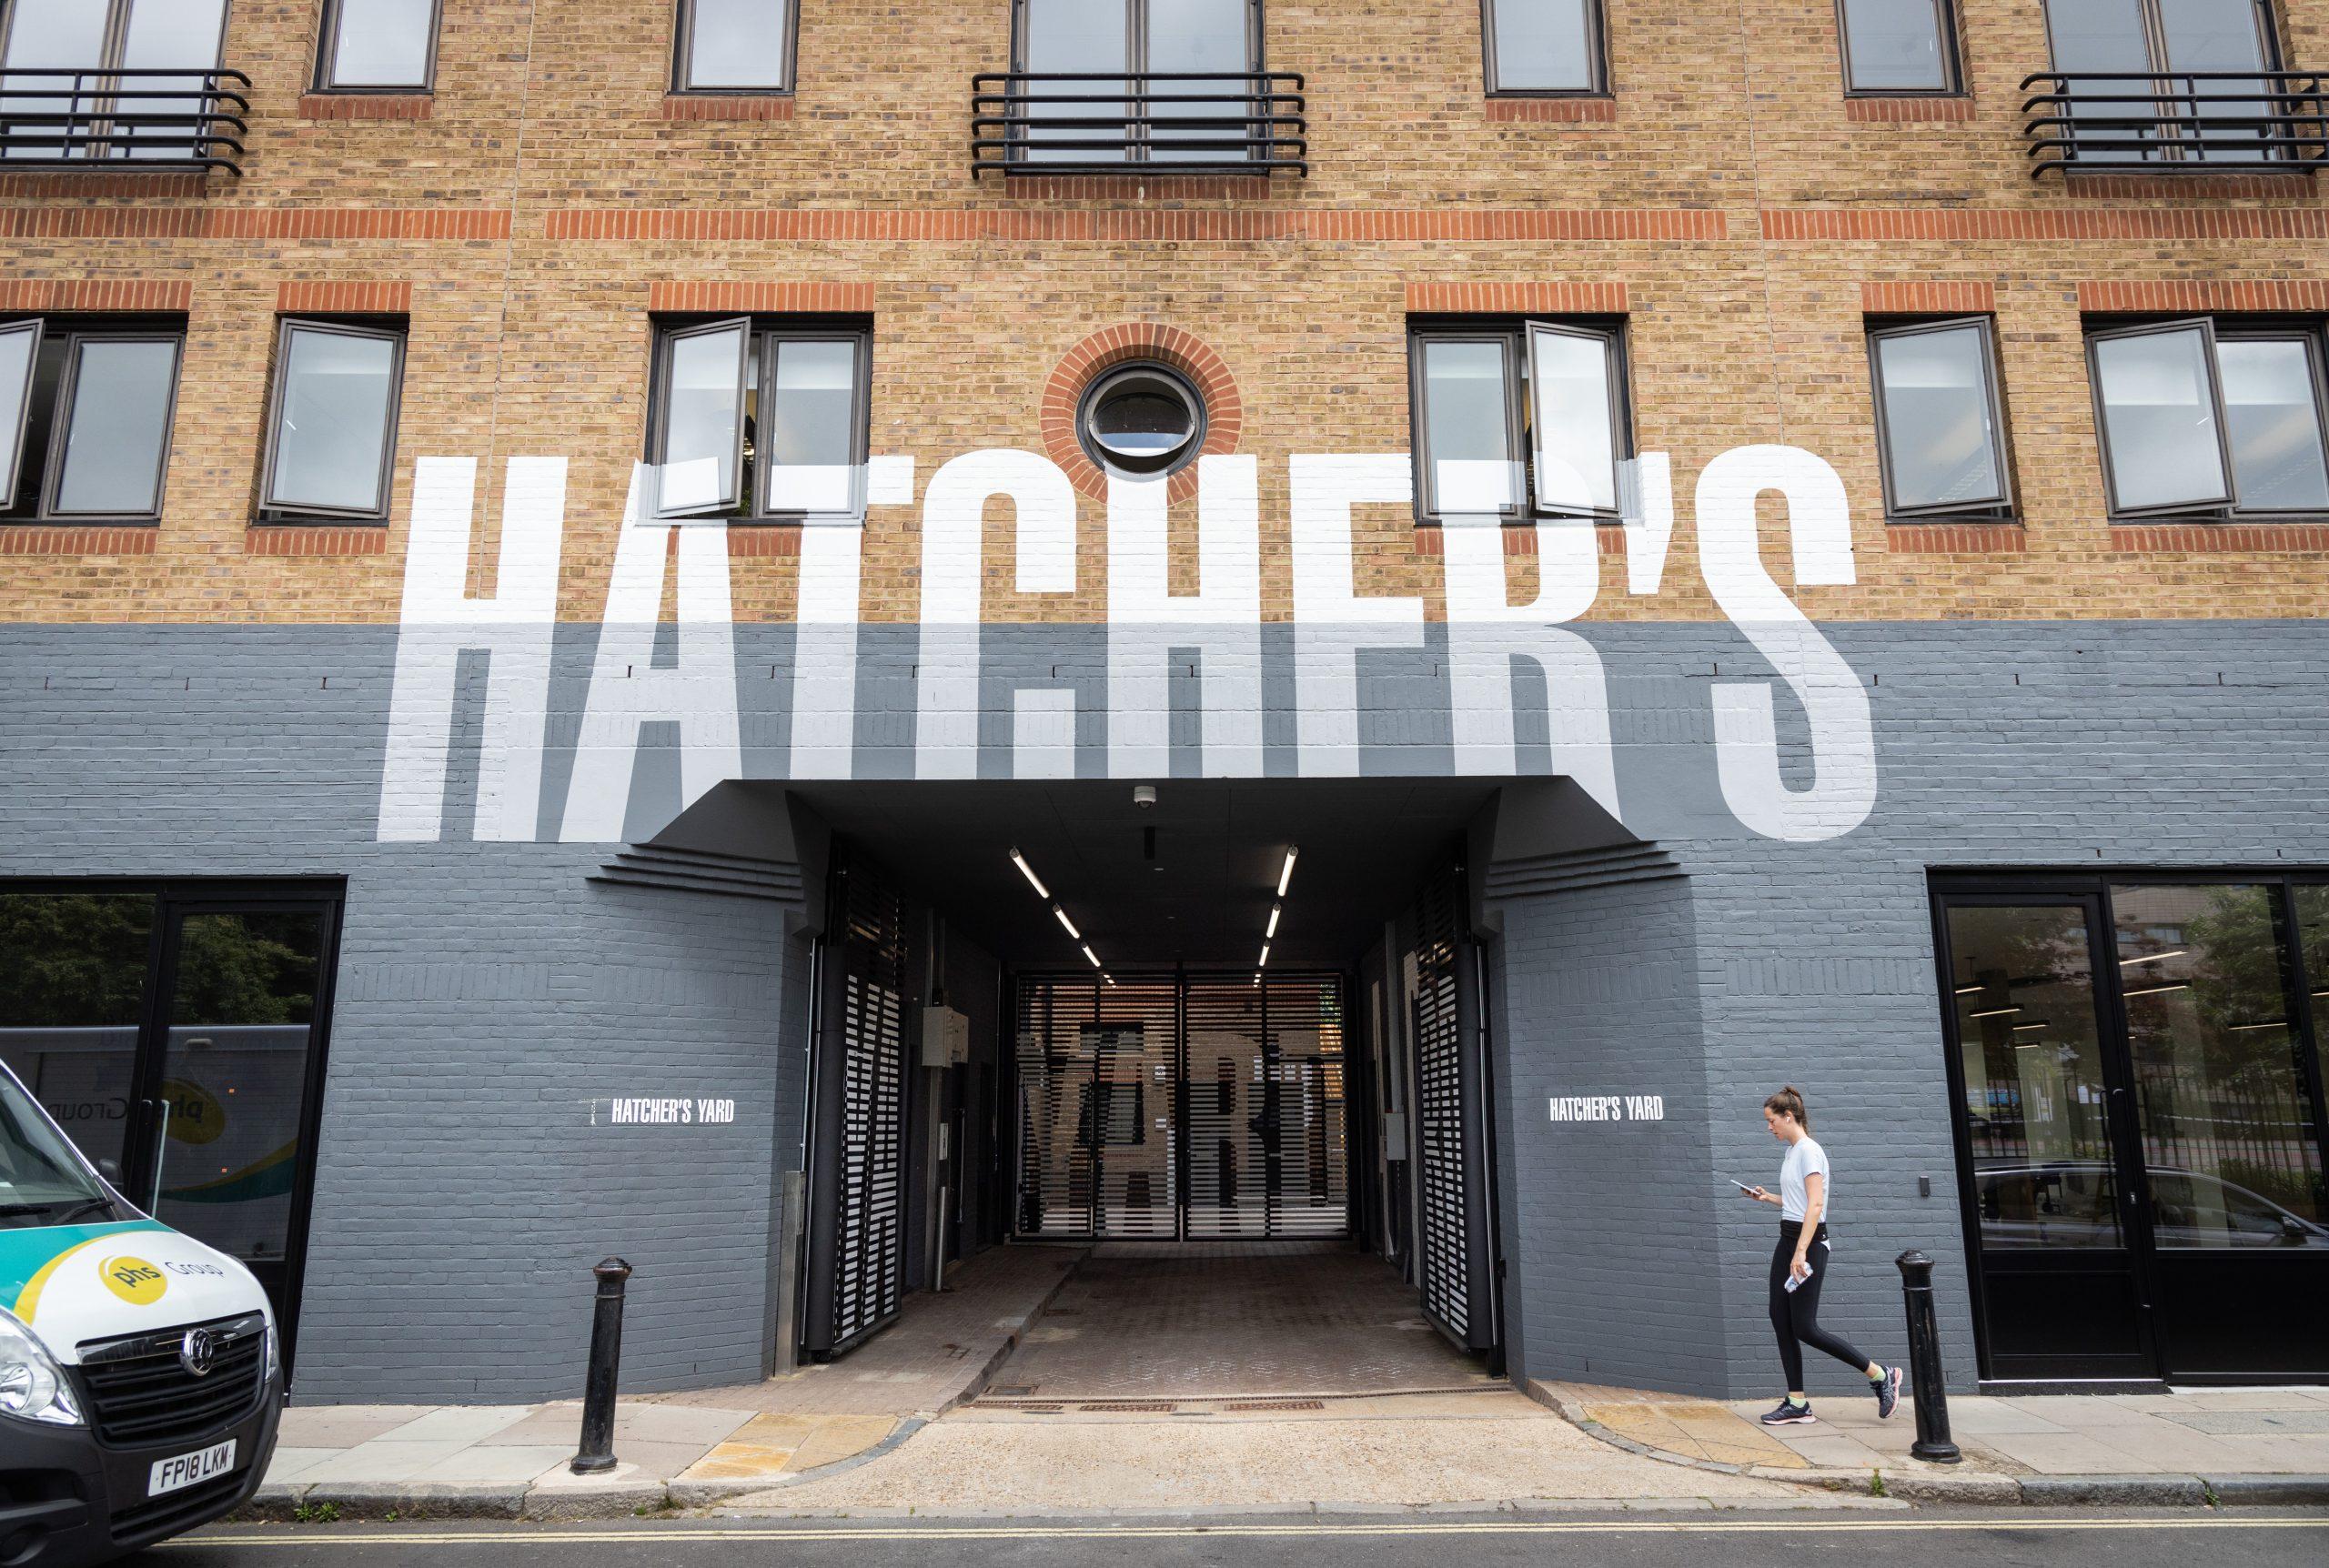 Hatchers Yard, 9 Tanner Street, London, SE1 3LE